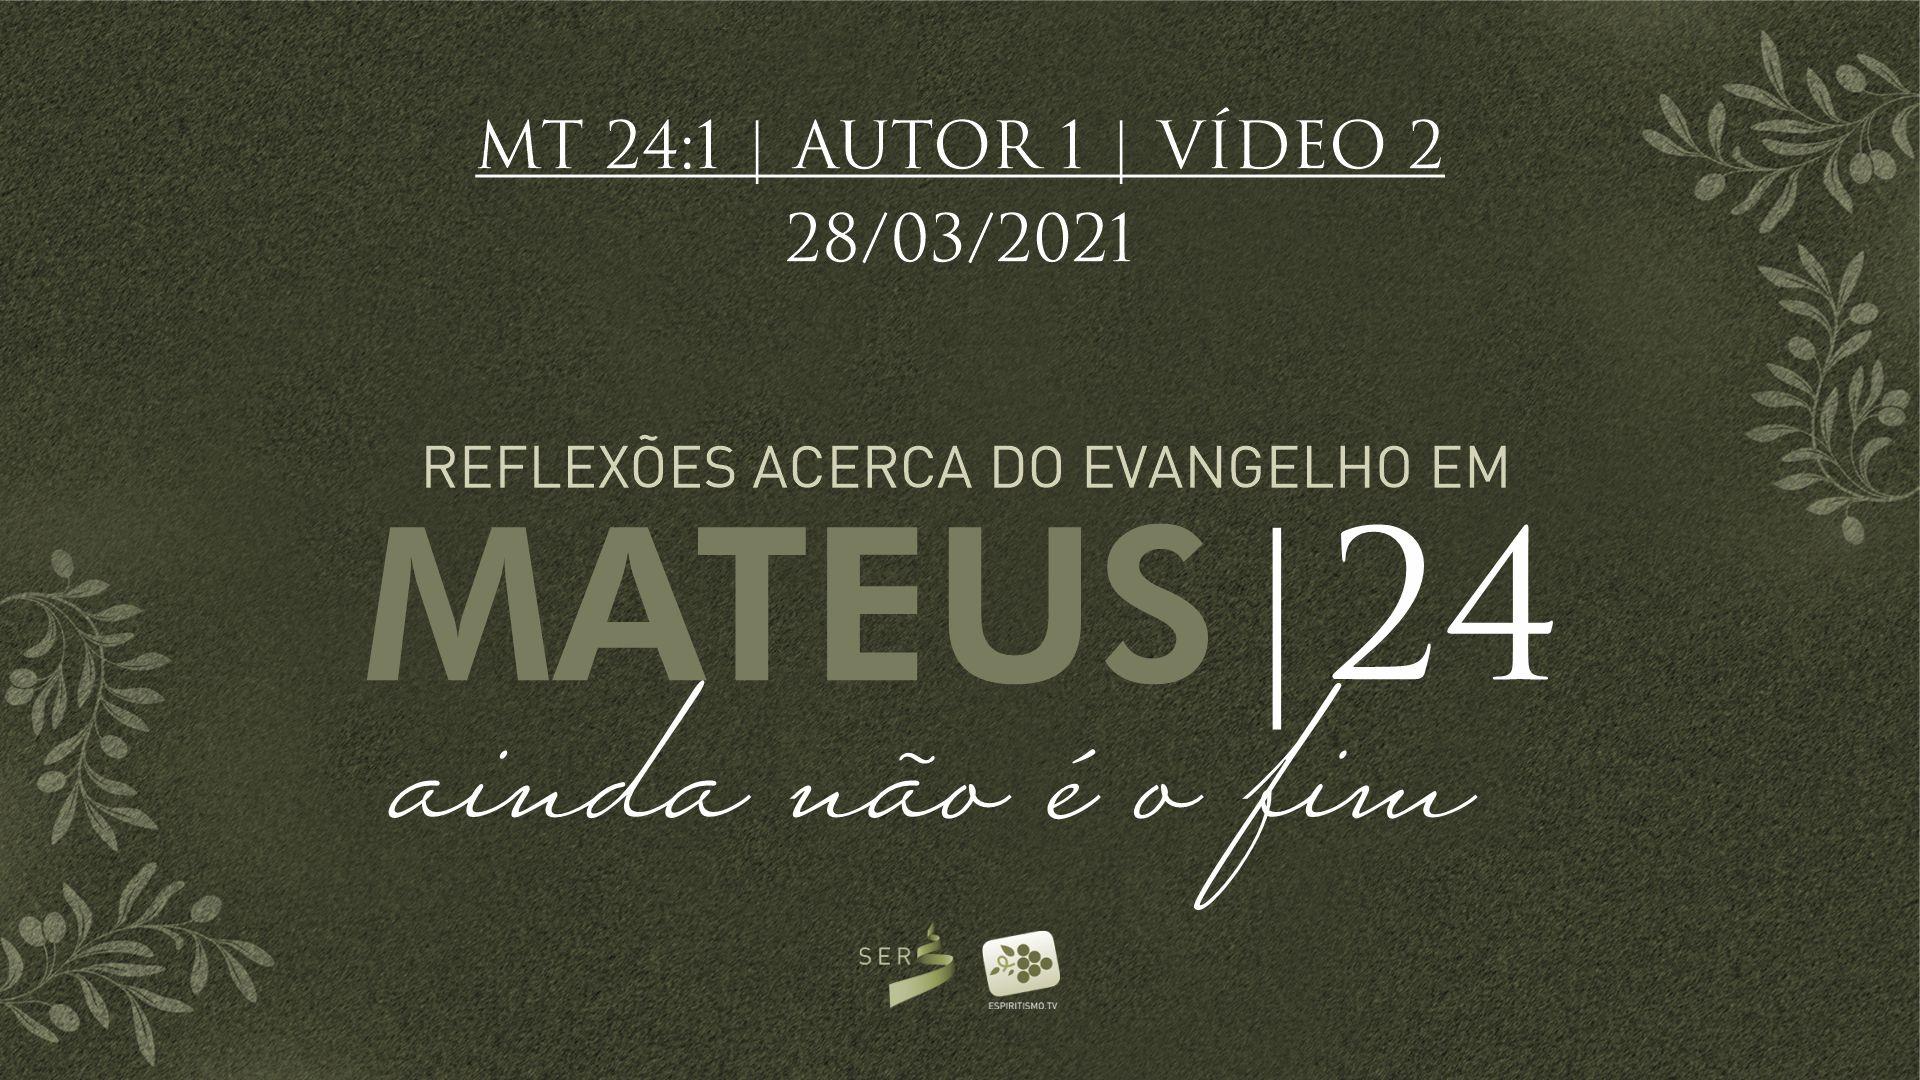 Vídeo   MT24 - AUTOR 1: VIDEO 02